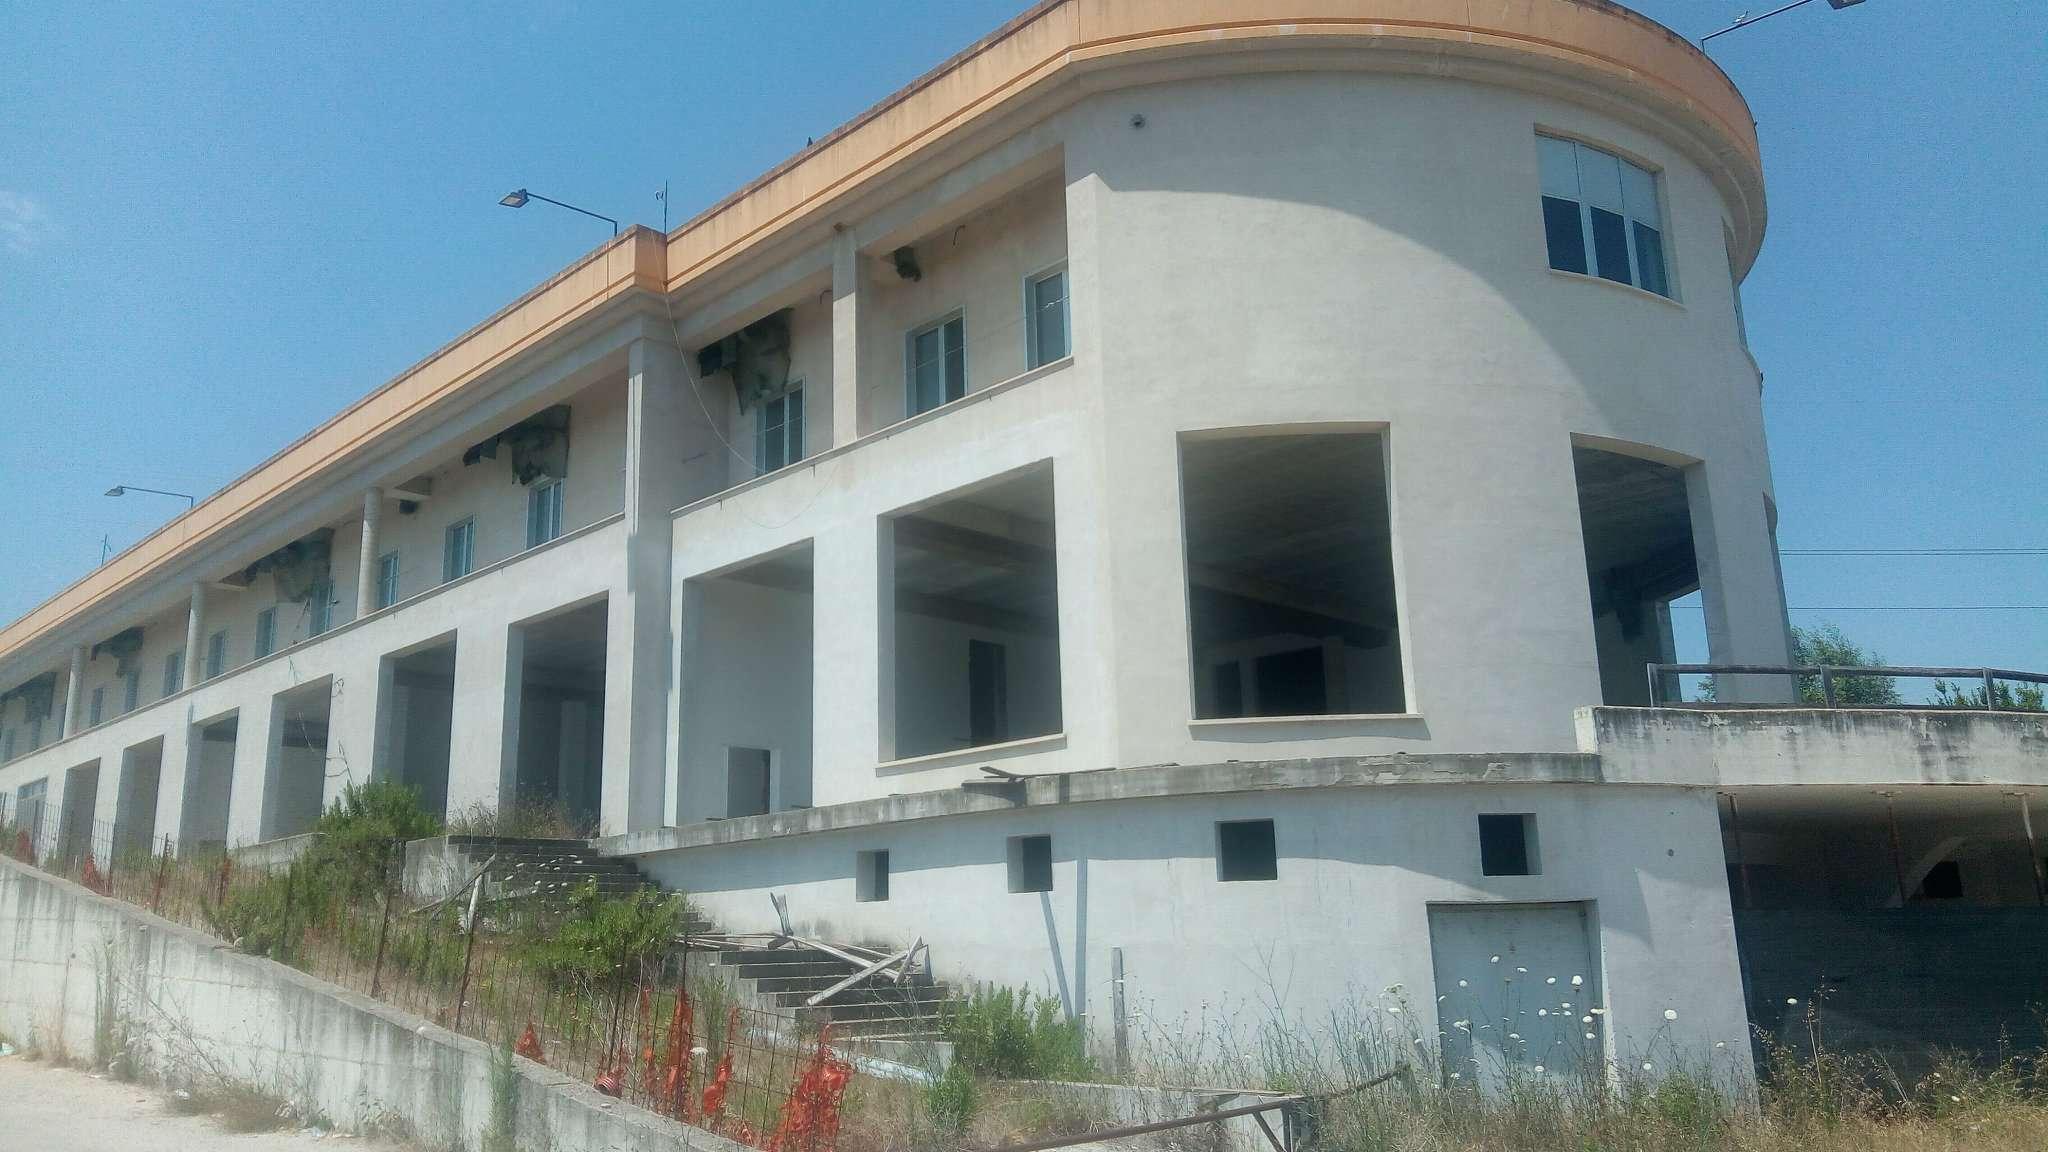 Hotel-Albergo in asta a Città Sant'Angelo (PE)